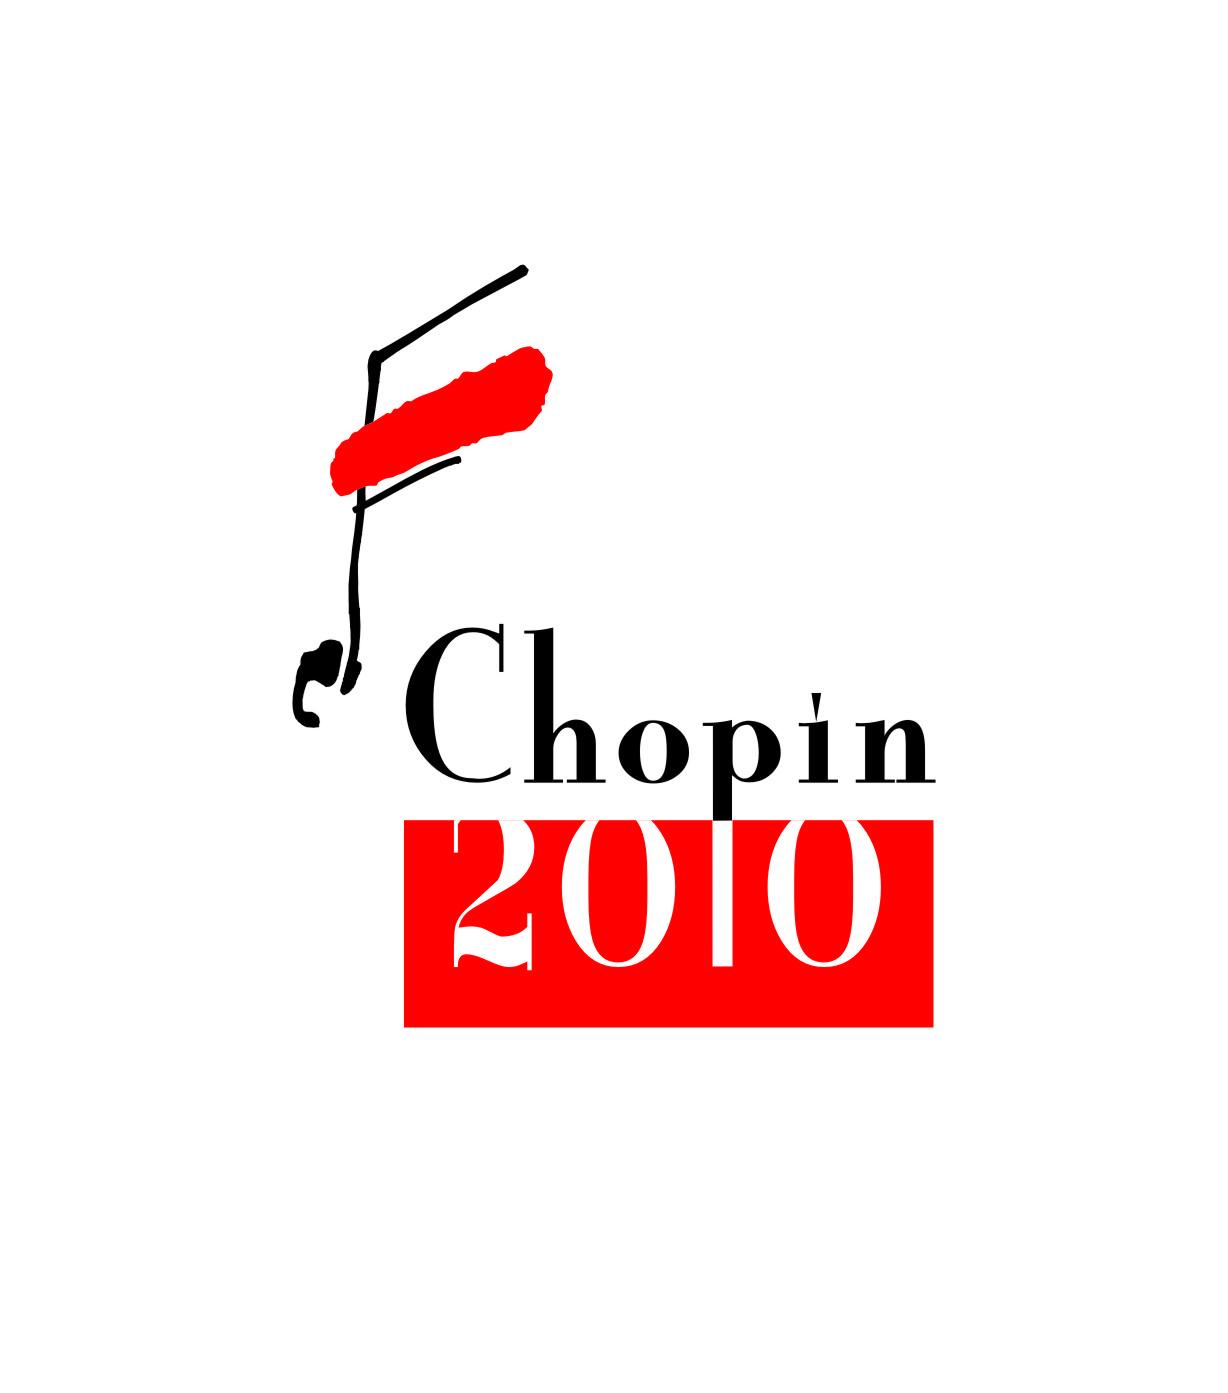 Logo_Chopin_2010_czerwone